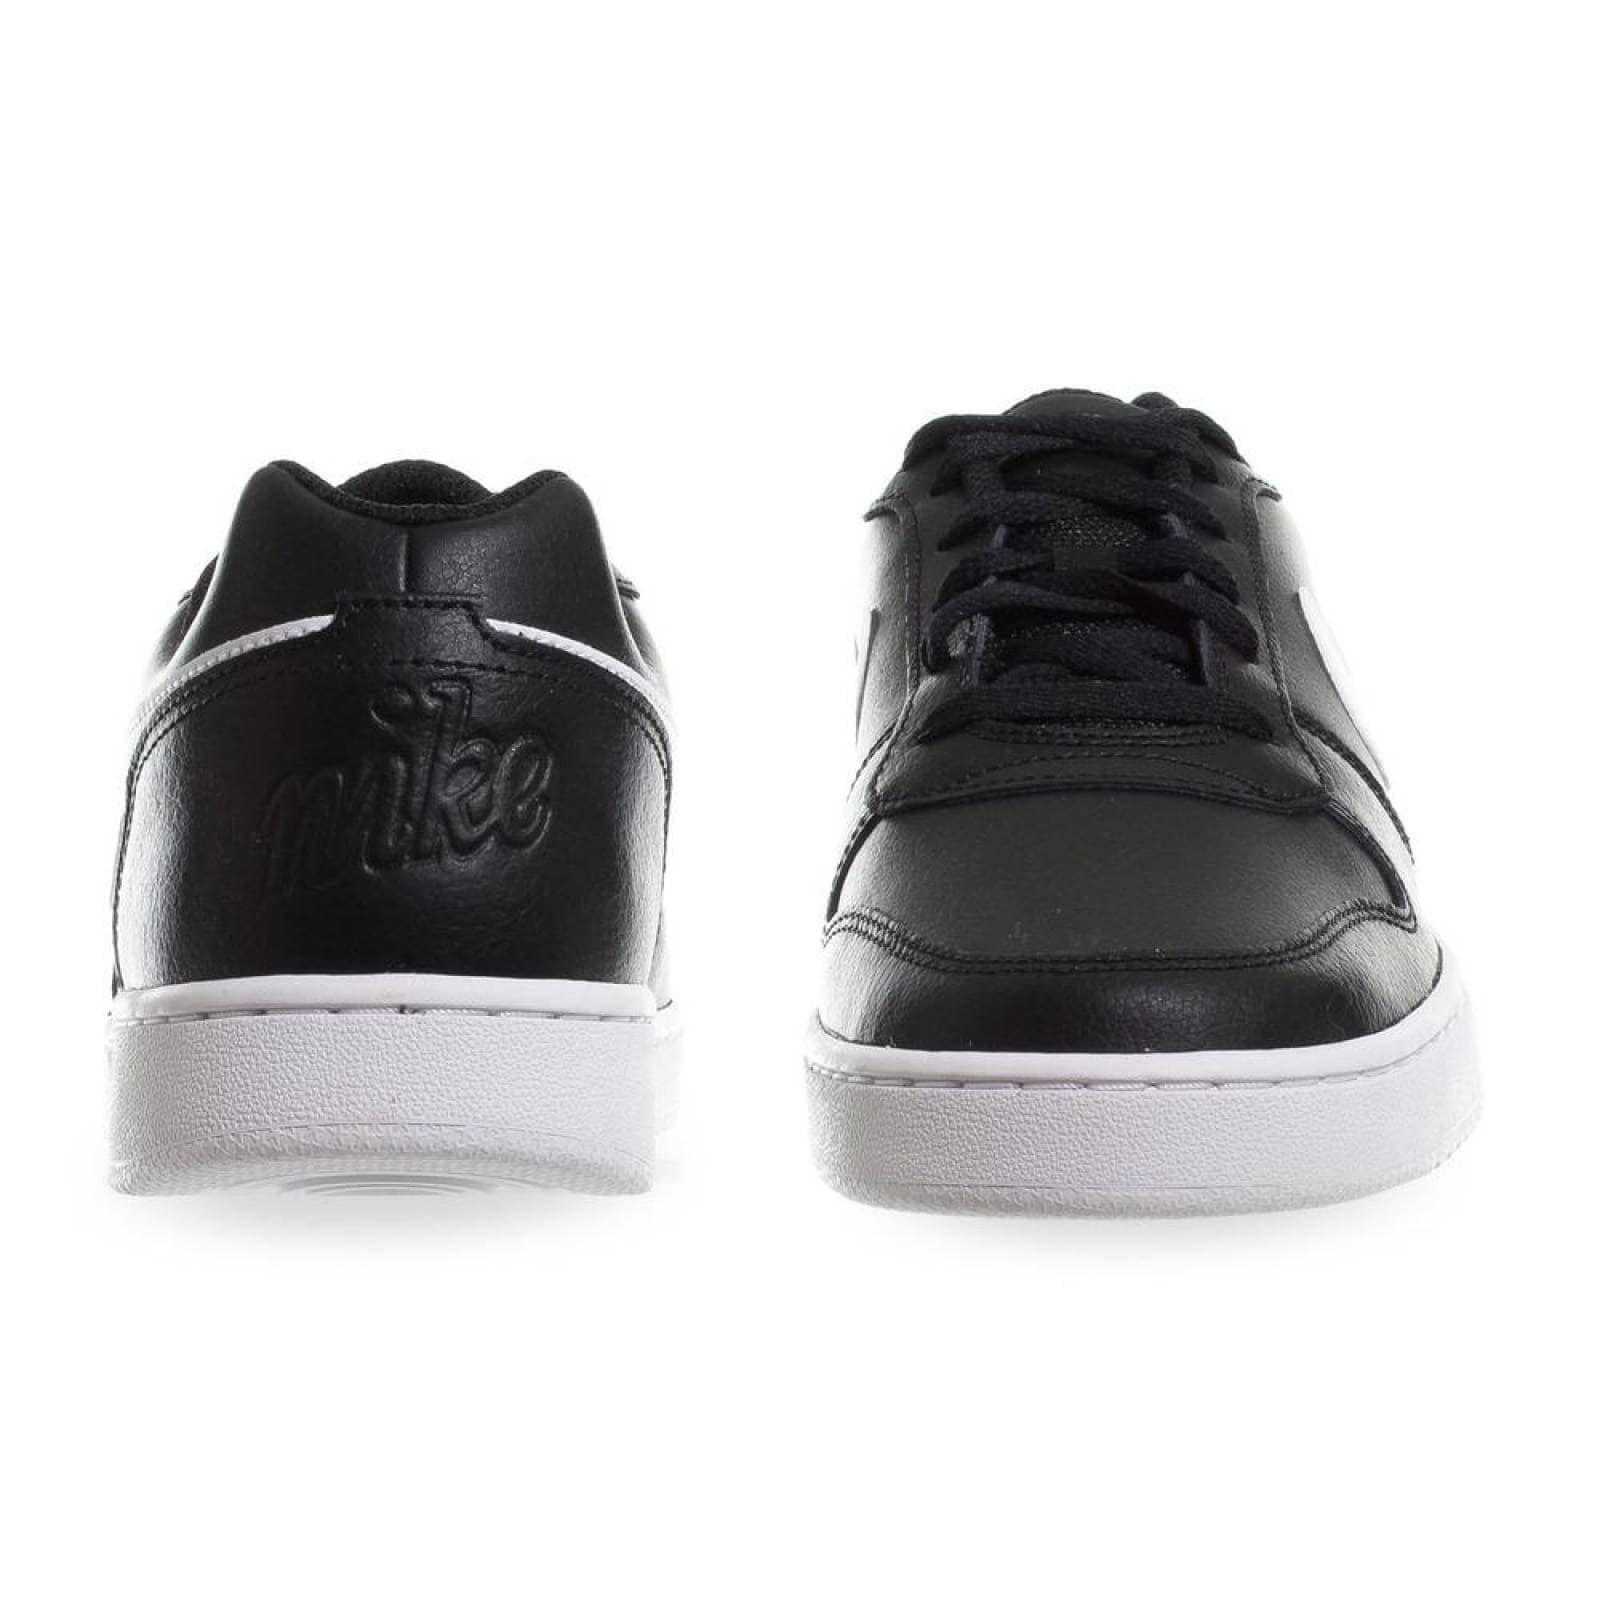 Tenis Nike Ebernon Low AQ1775002 Negro Hombre